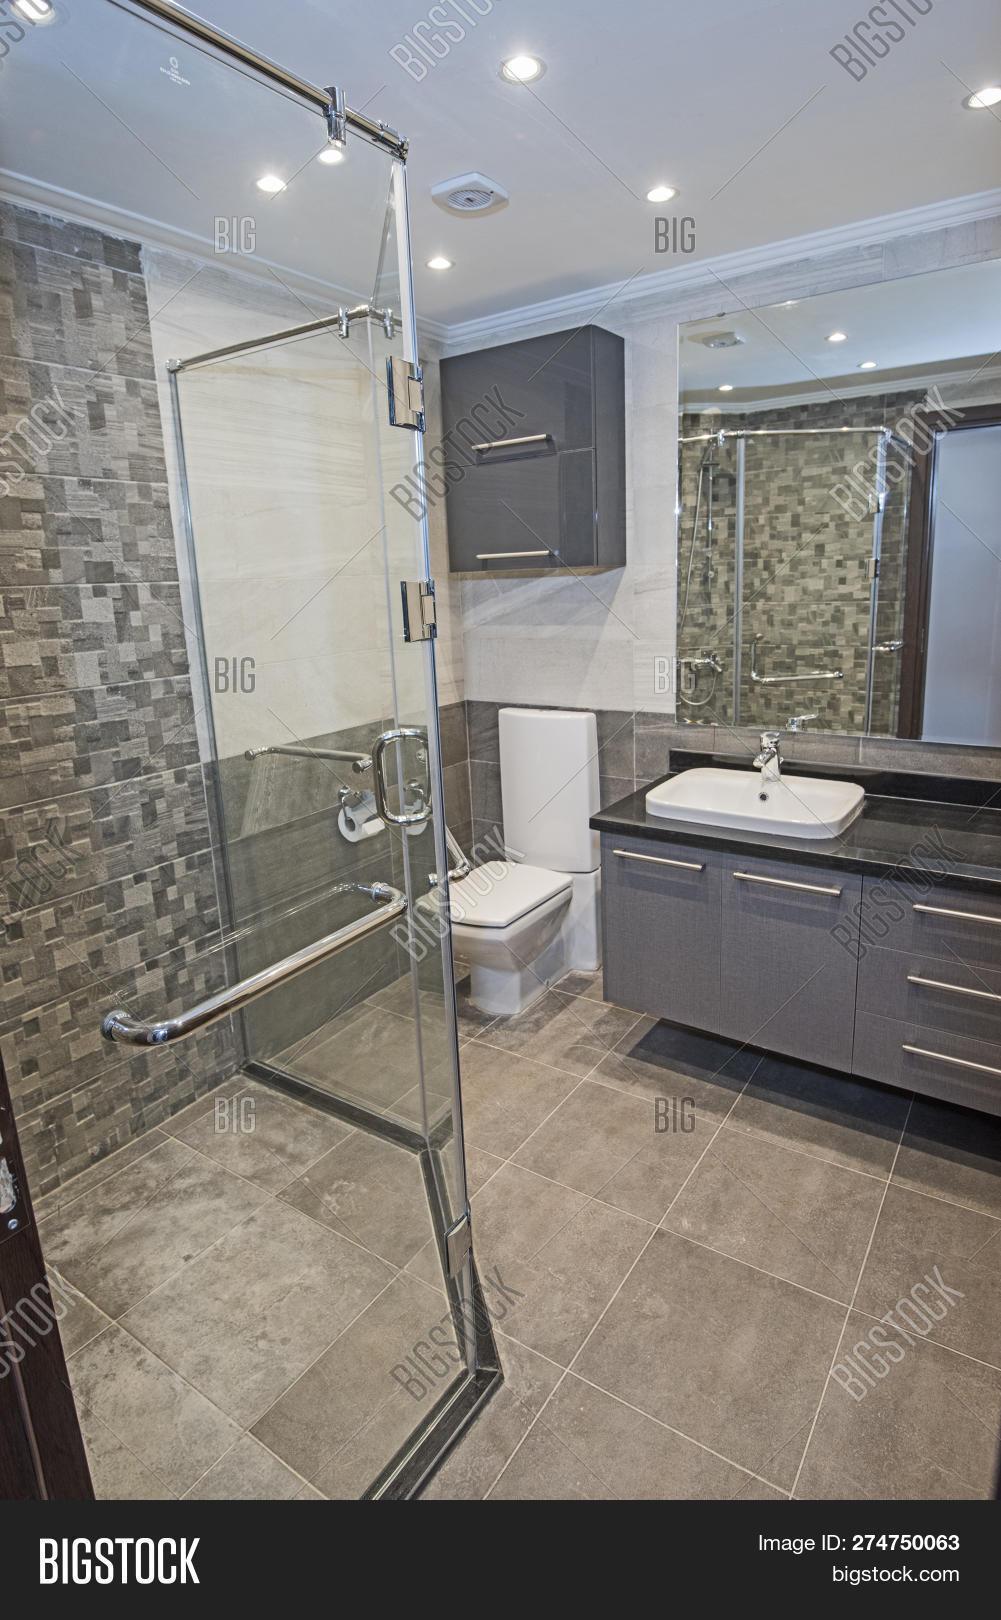 Interior Design Luxury Image Photo Free Trial Bigstock